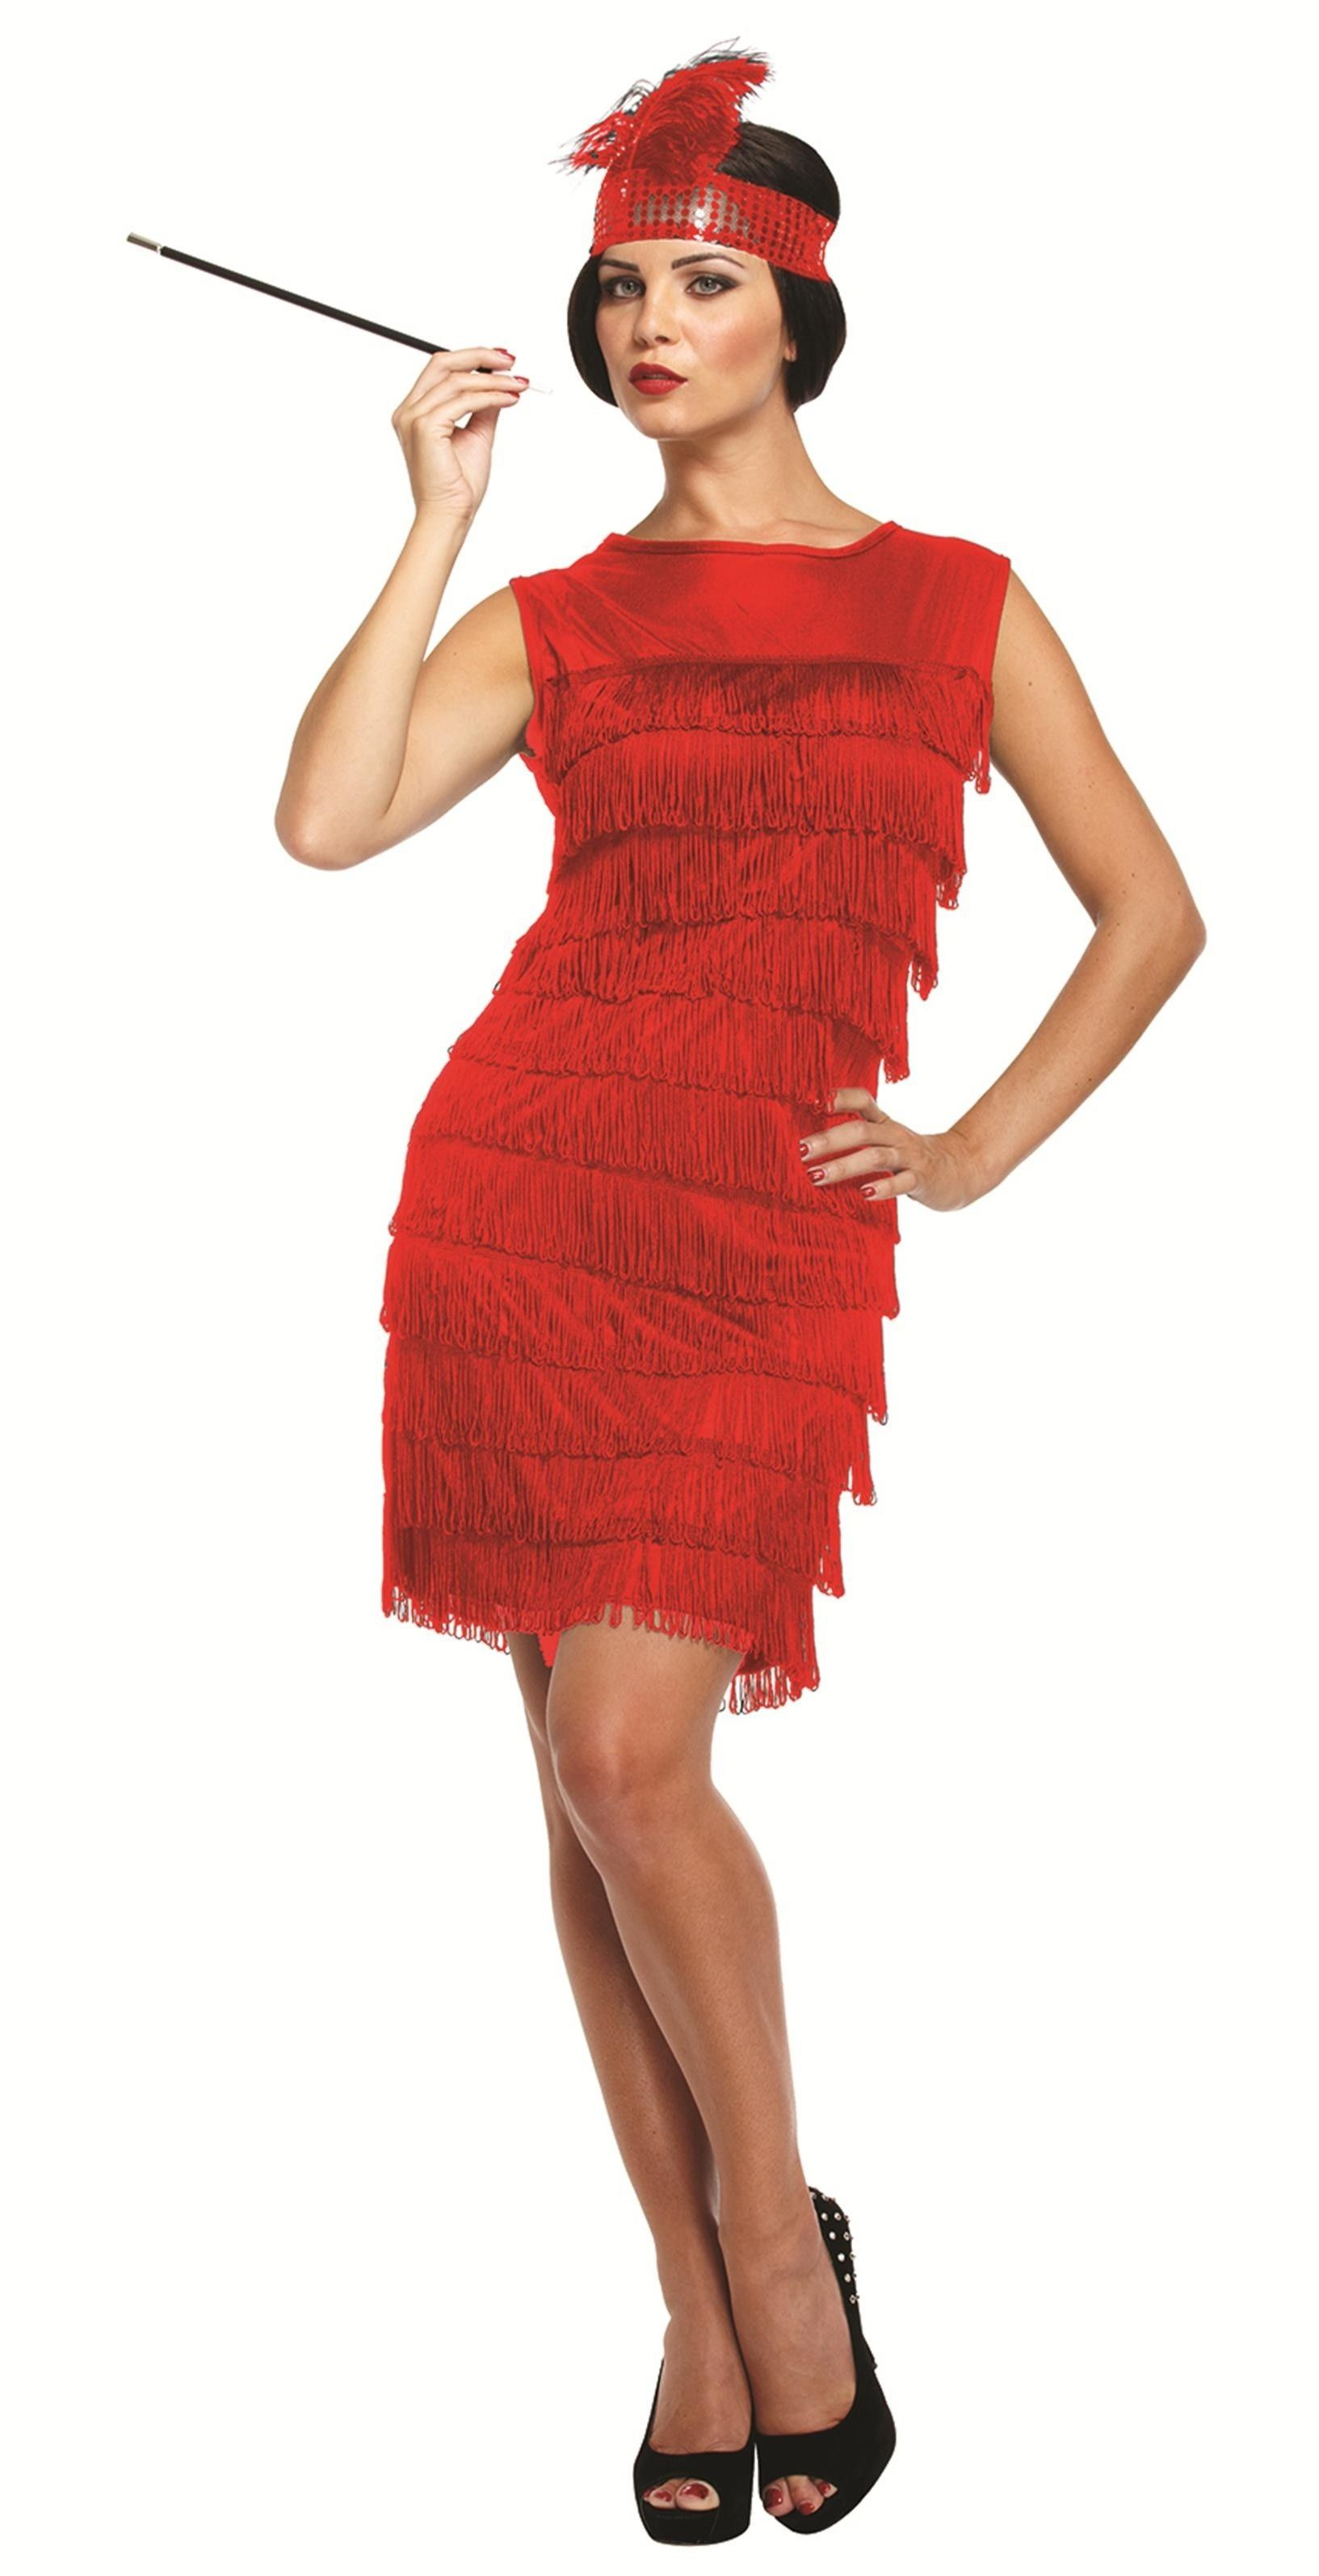 Jaren 20 jurkje rood kopen? || Confettifeest.nl